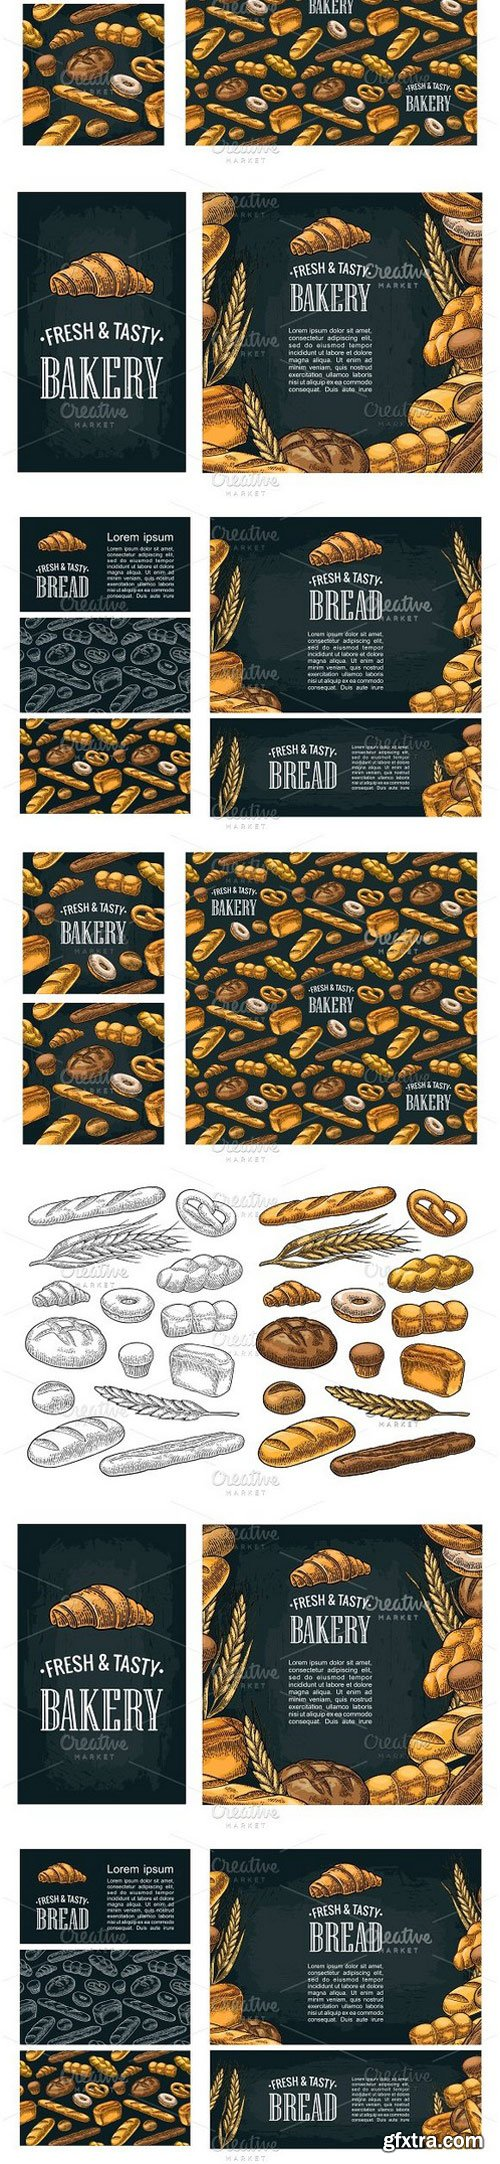 CM - Bundle of sets of bakery, bread 1270185